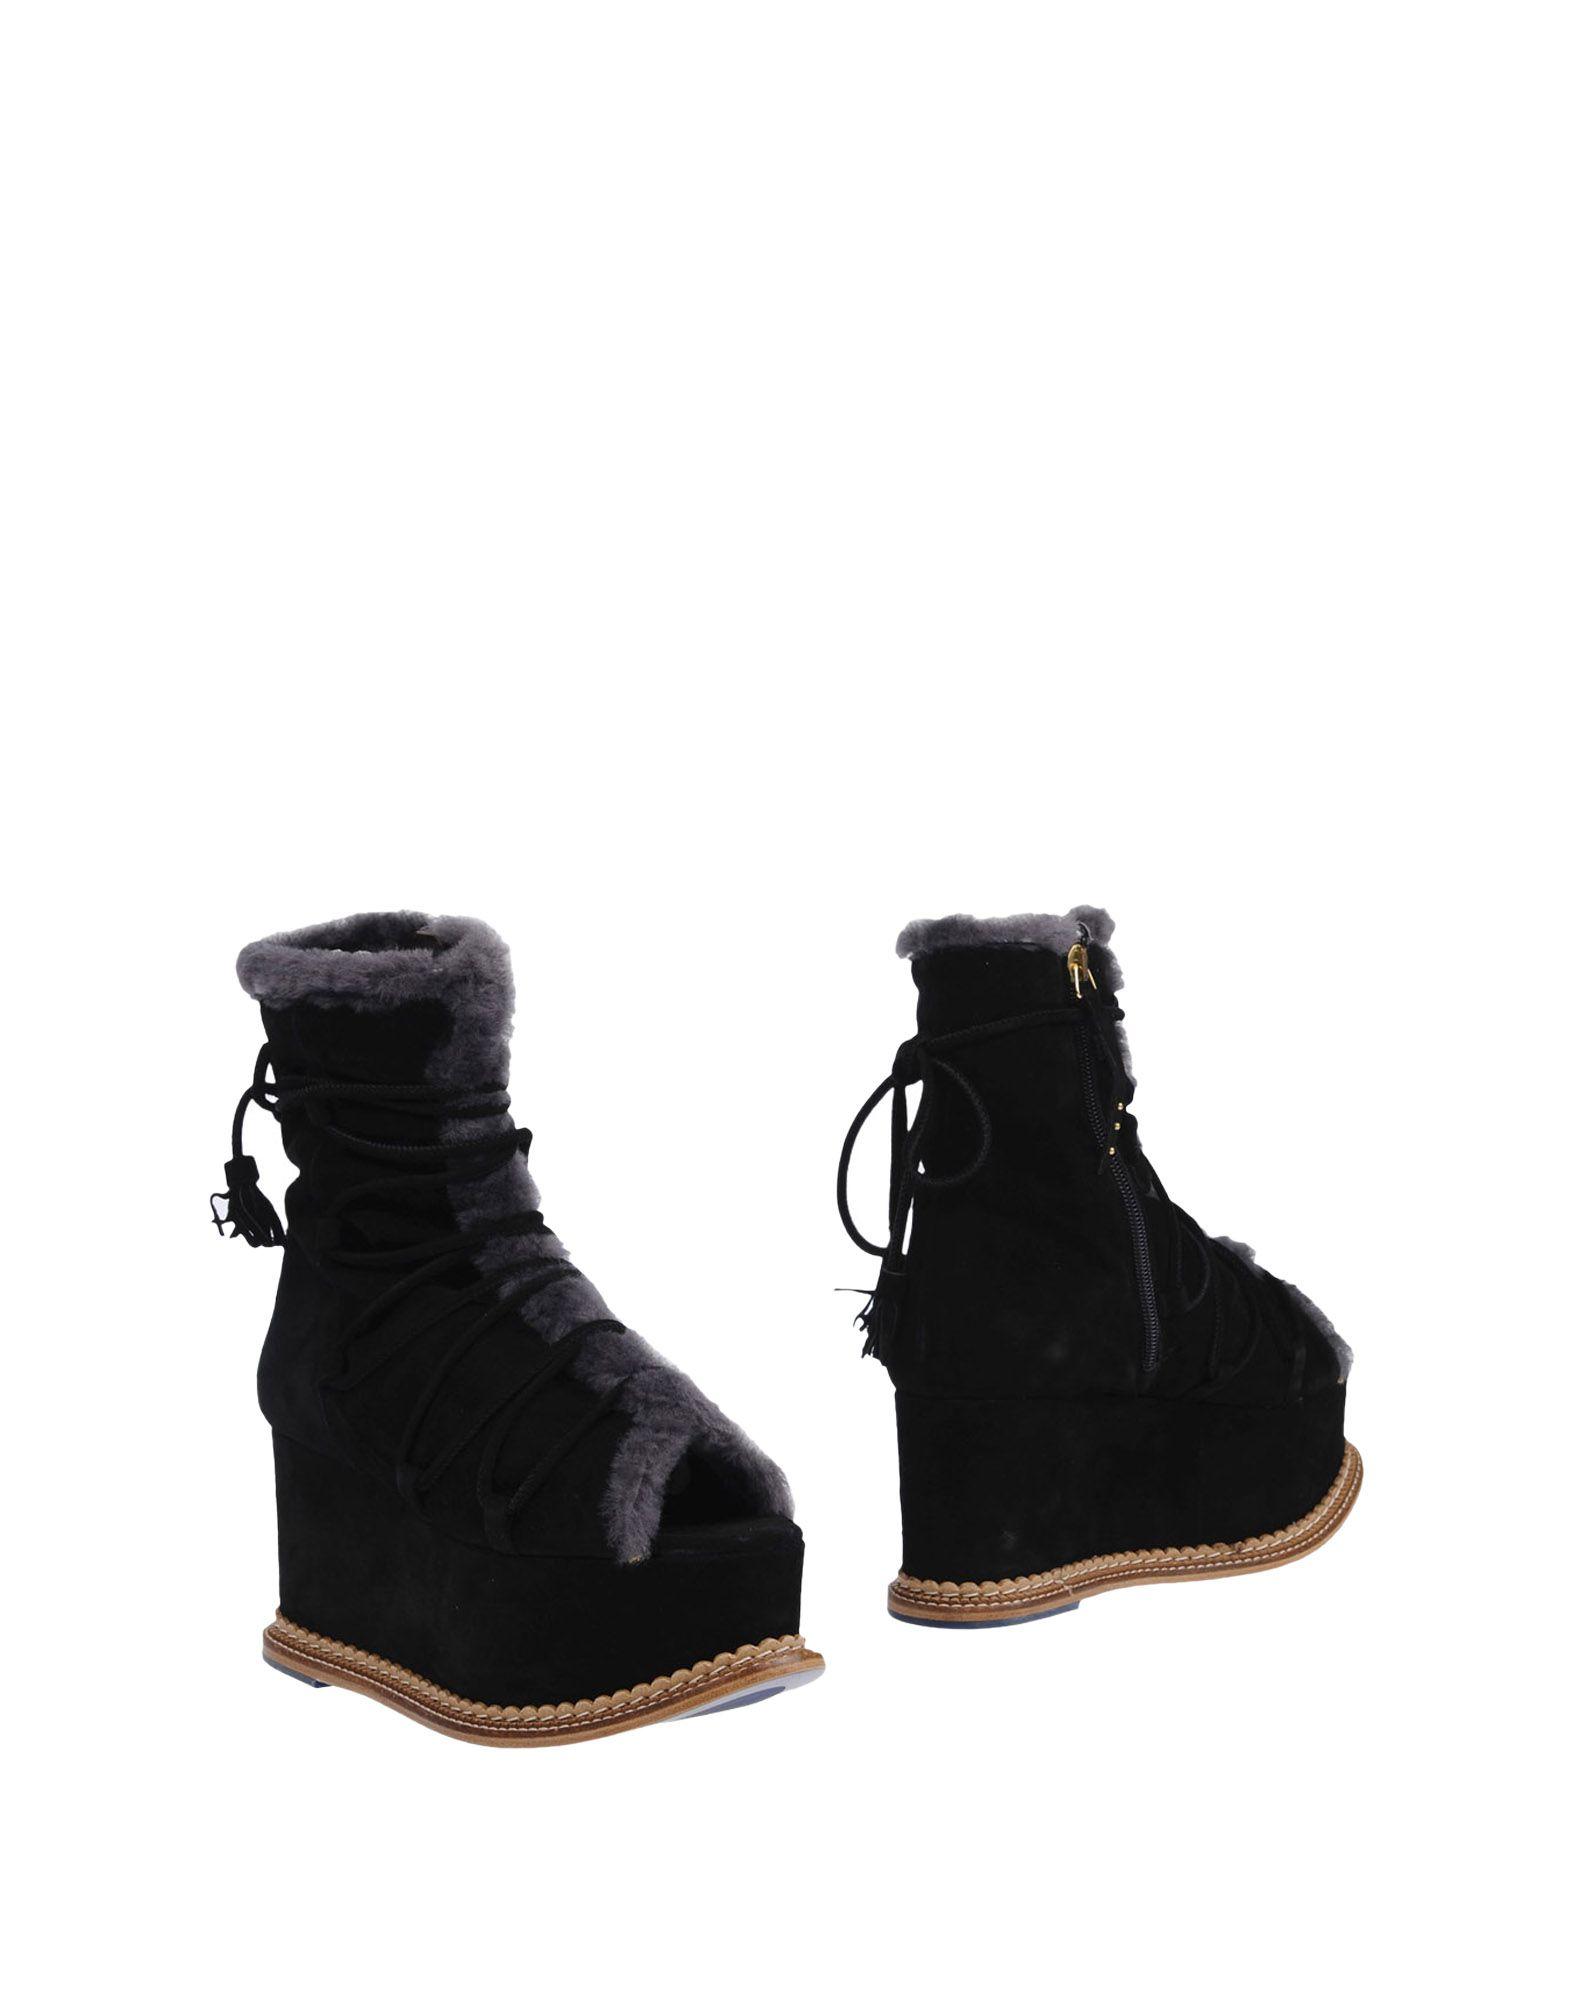 Paloma Barceló Stiefelette Damen  11224485GQ Gute Qualität beliebte Schuhe